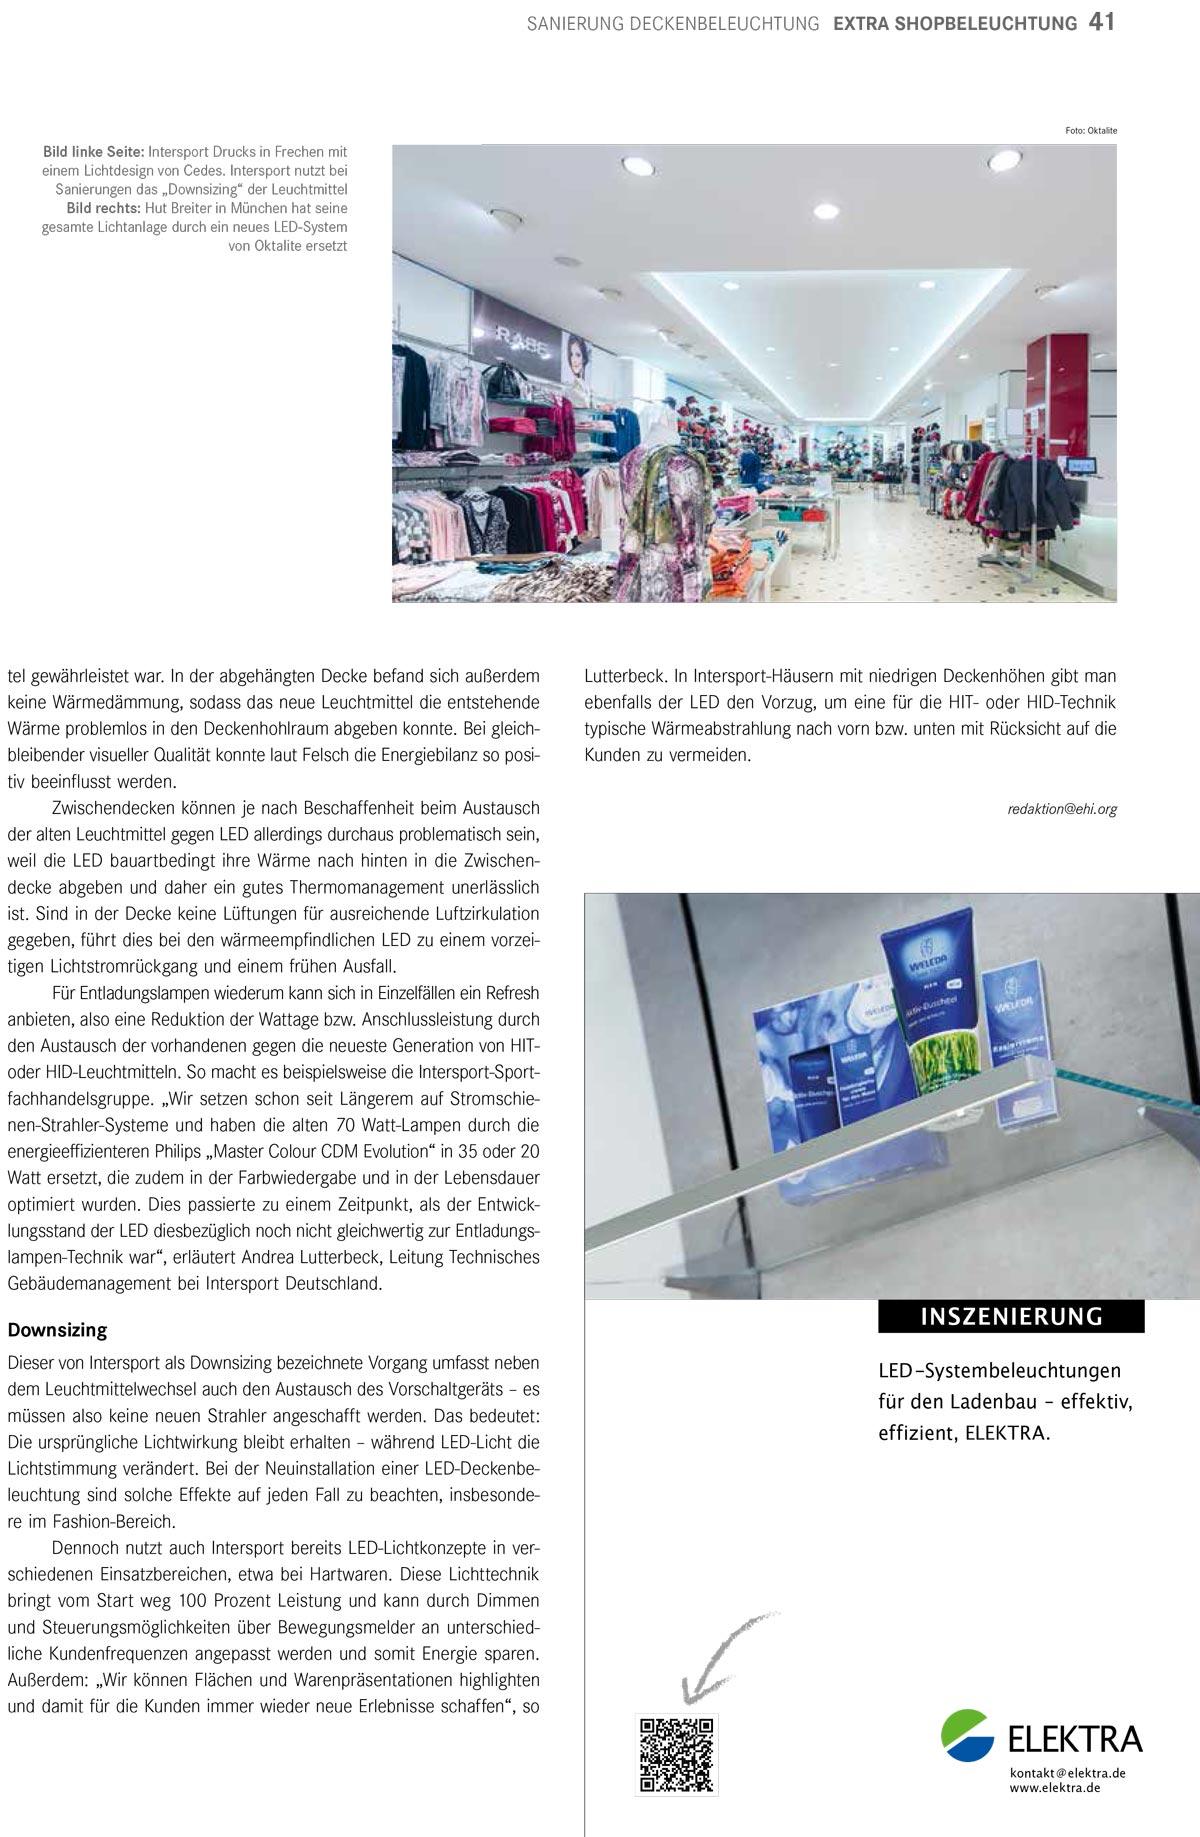 stores+shops 012016 S41